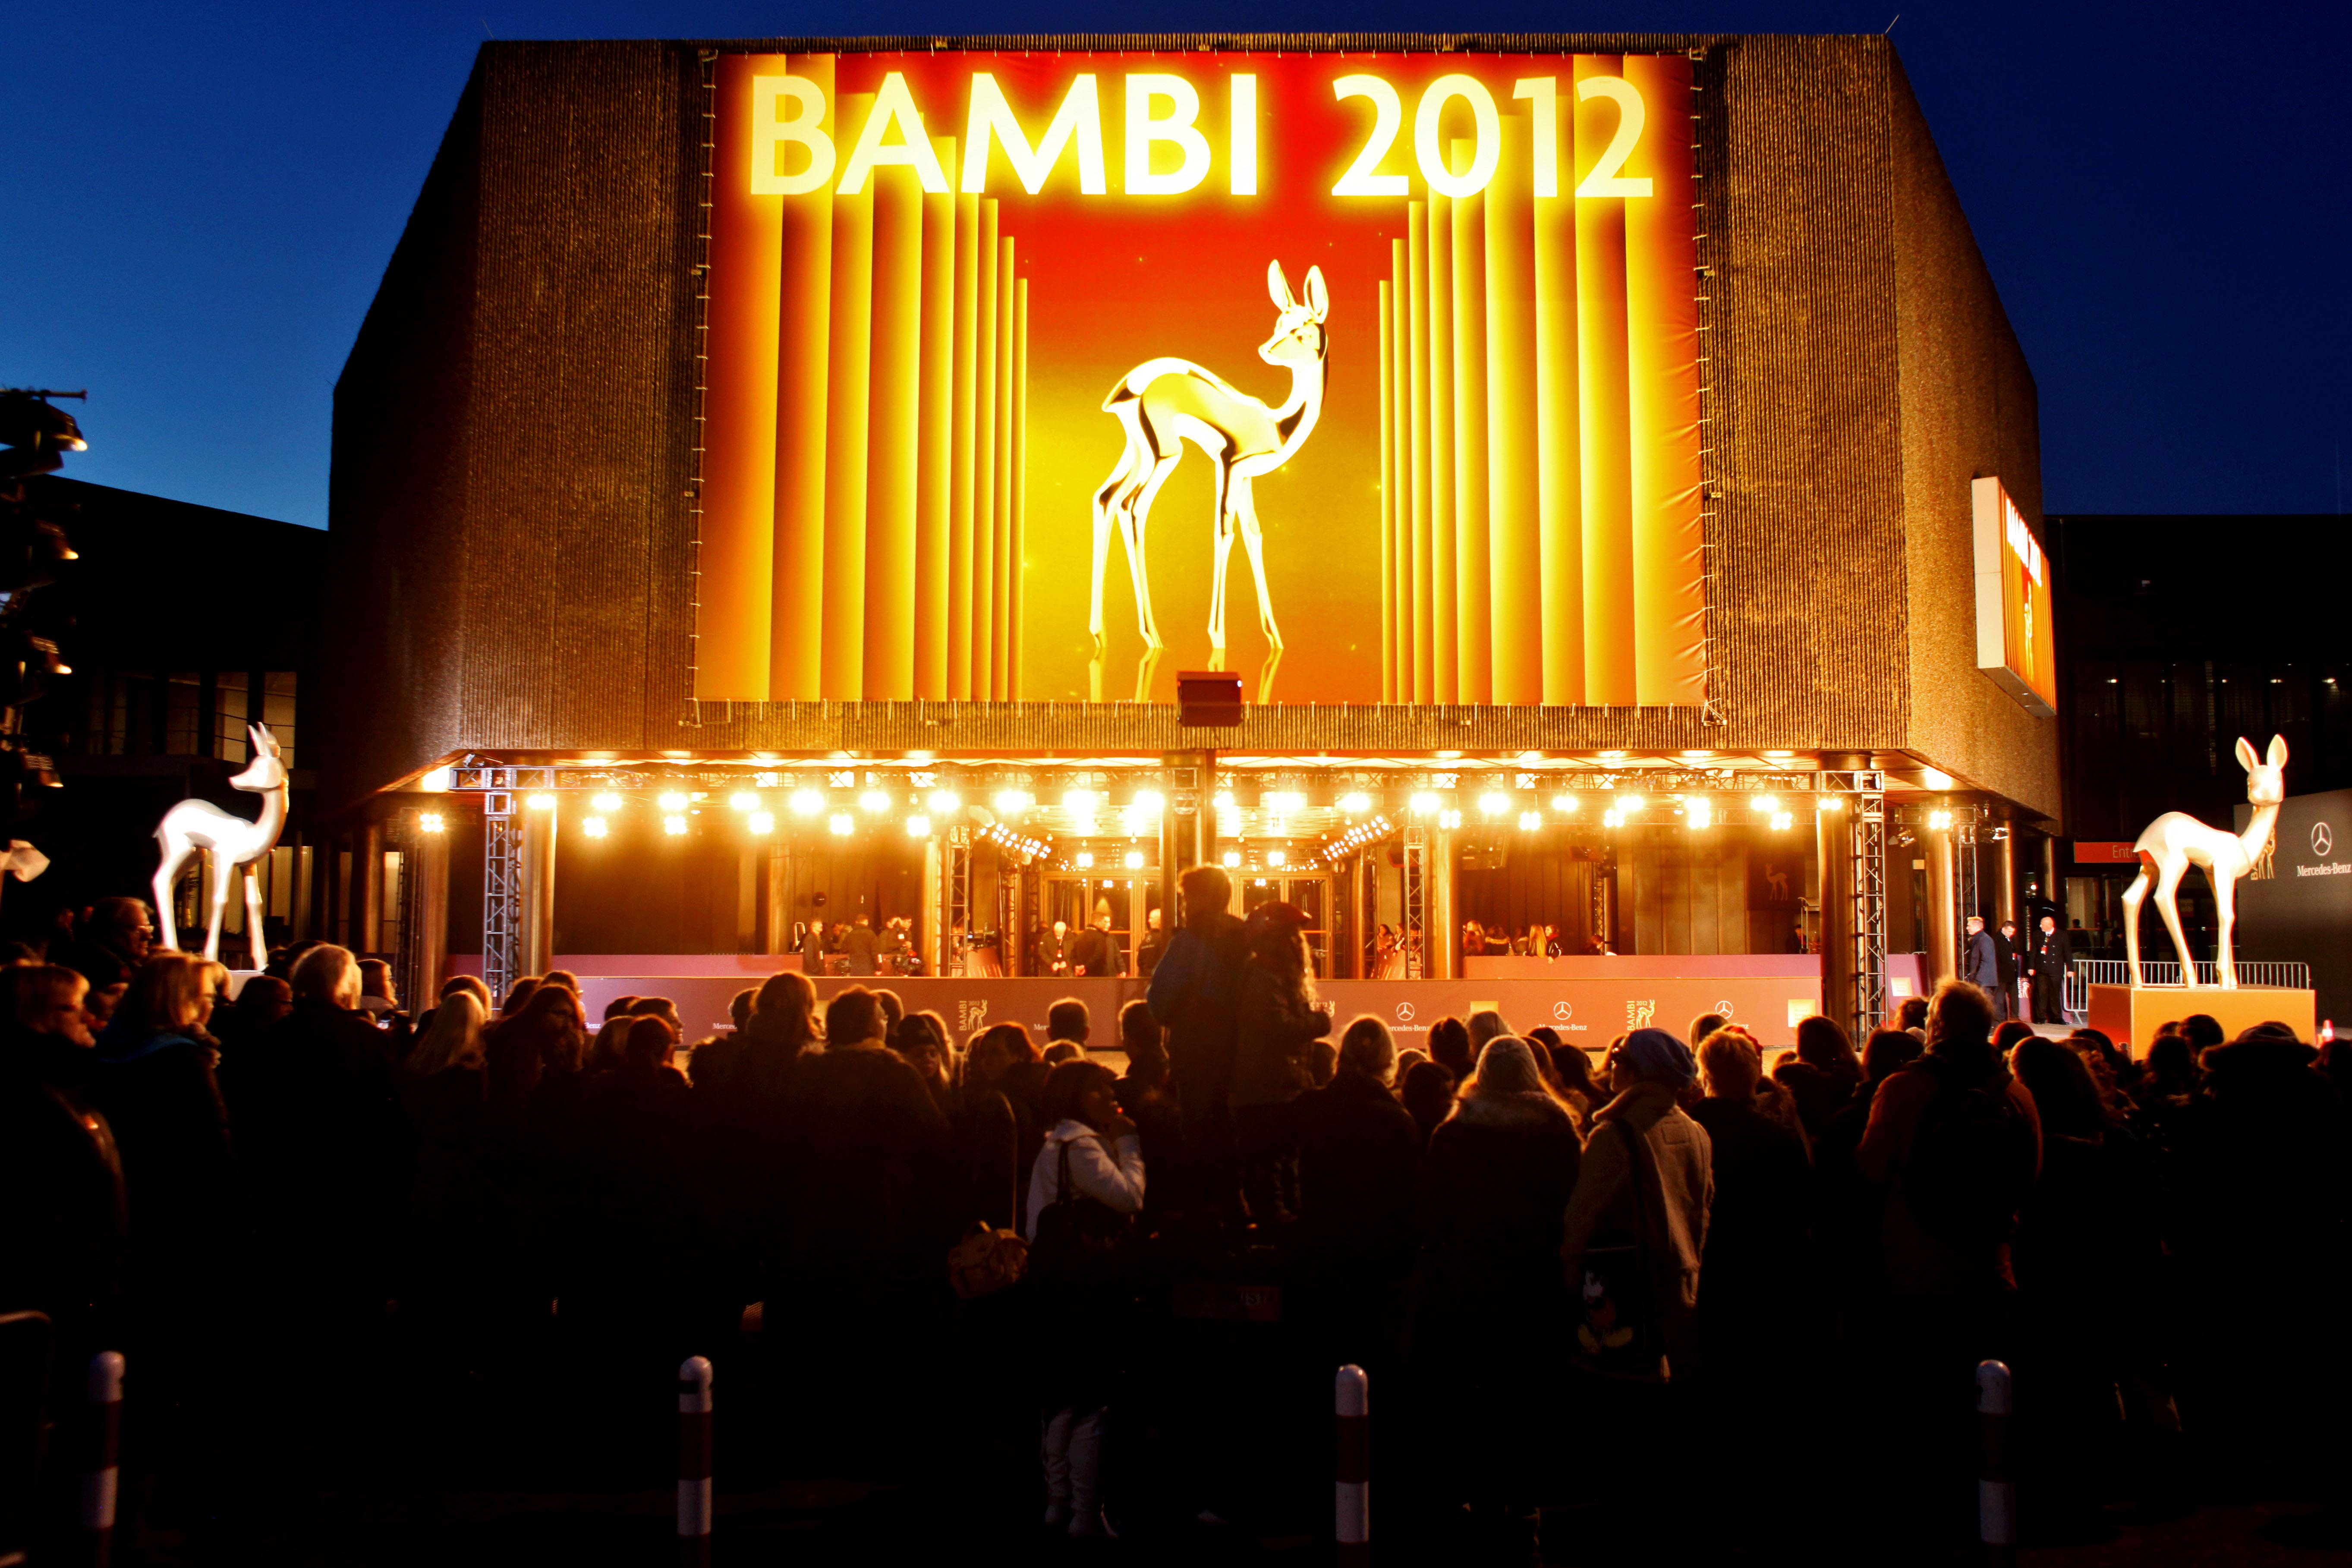 BAMBI 2012 fand am 22. November in der Rheinmetropole Düsseldorf statt © Hubert Burda Media